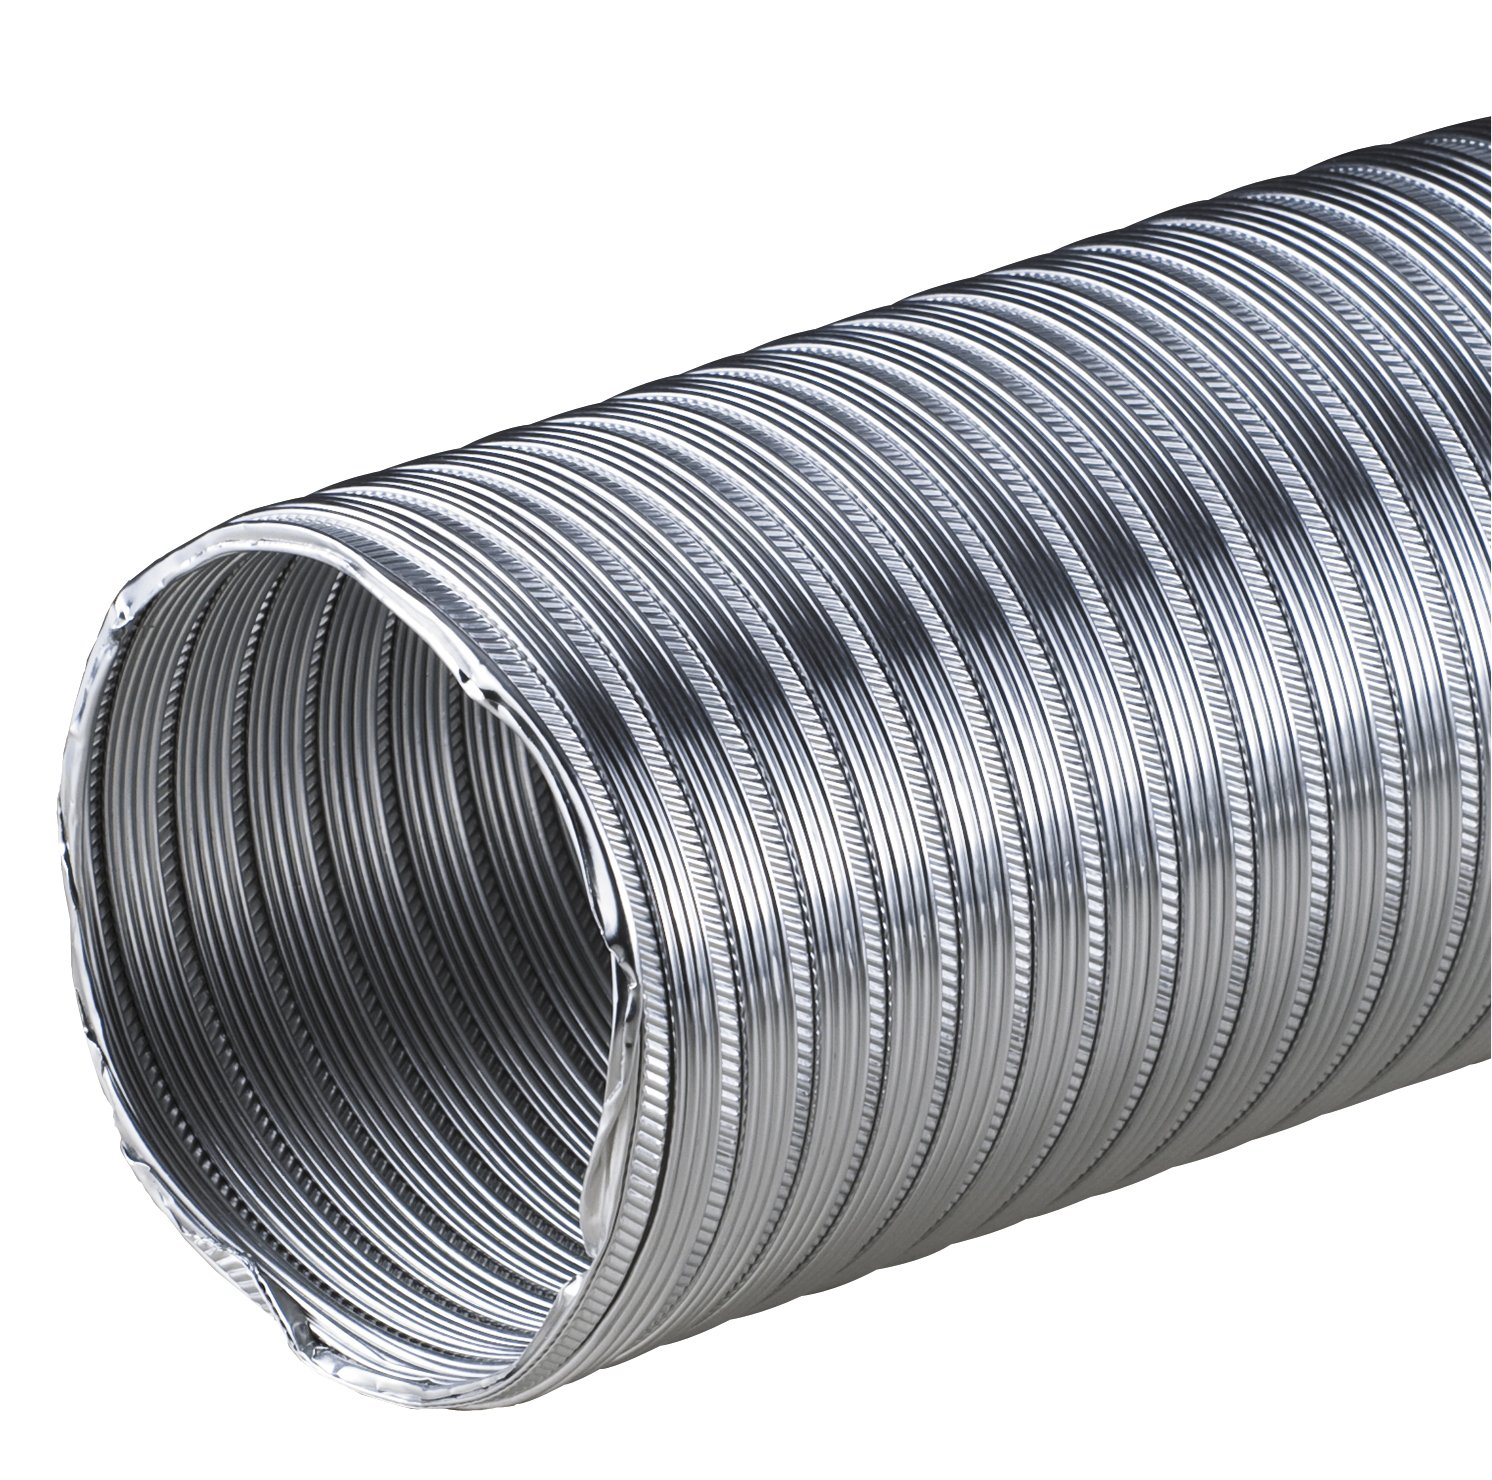 Flexible Aluminium Flexible Pipe 3M Pipe Diameter 115mm 115mm Aluminium Tube Flex Hose Flexible Aluminium Pipe Flexible Aluminium Tube Aluminium Heat Resistant AF MKK-SHOP